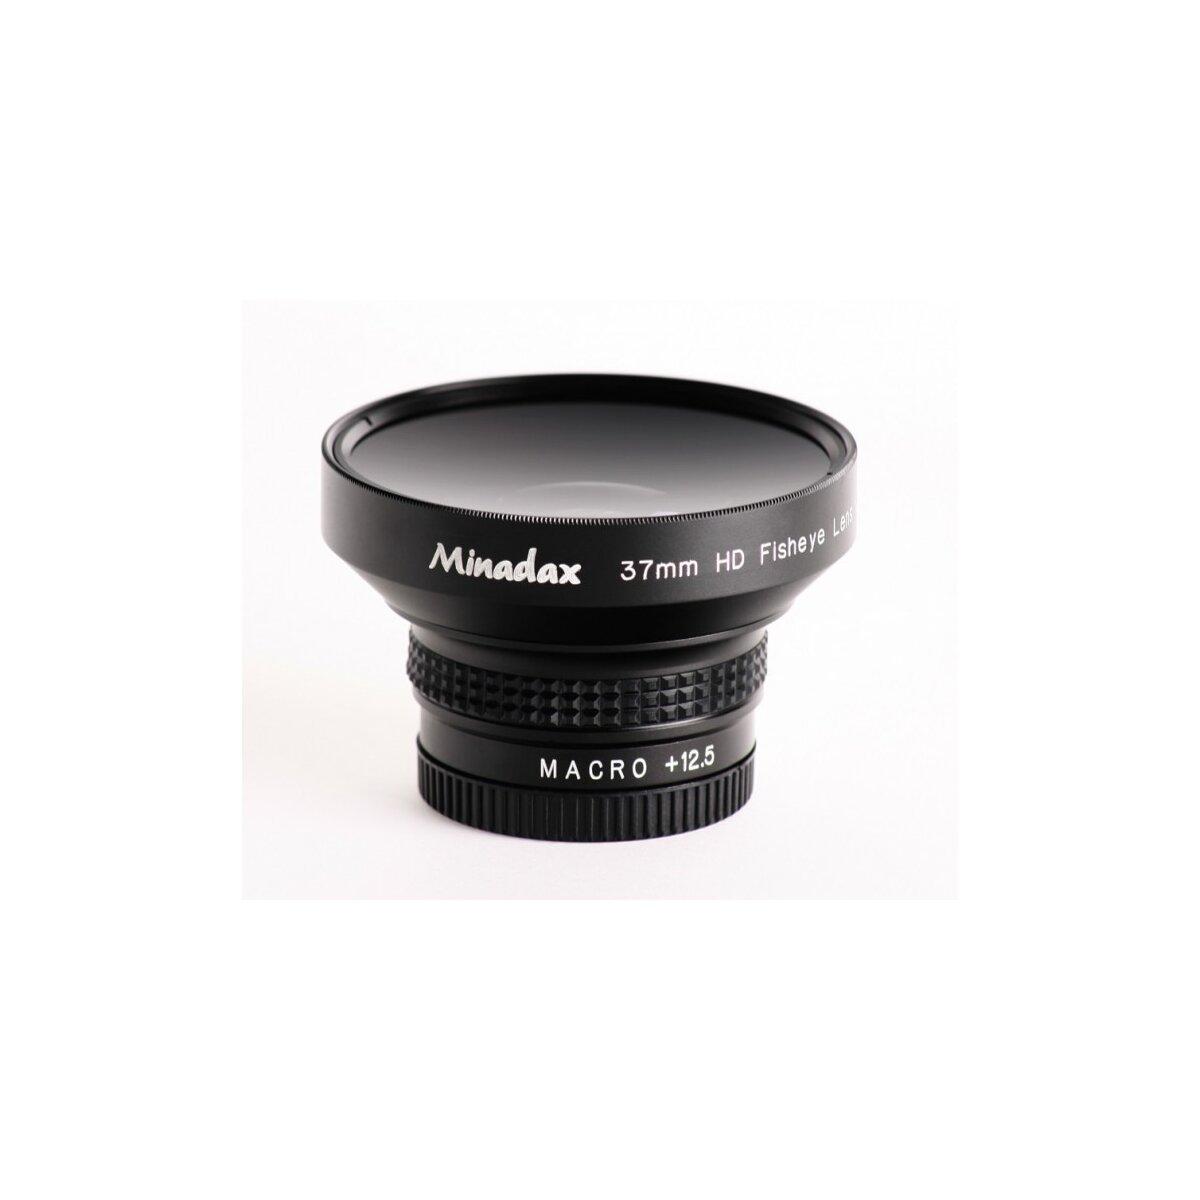 Minadax 0.25x Fisheye Vorsatz kompatibel mit Sony HDR-XR500, HDR-XR520, HDR-XR550, DCR-HC85, DCR-HC1000, DCR-SR190, DCR-SR290 sw